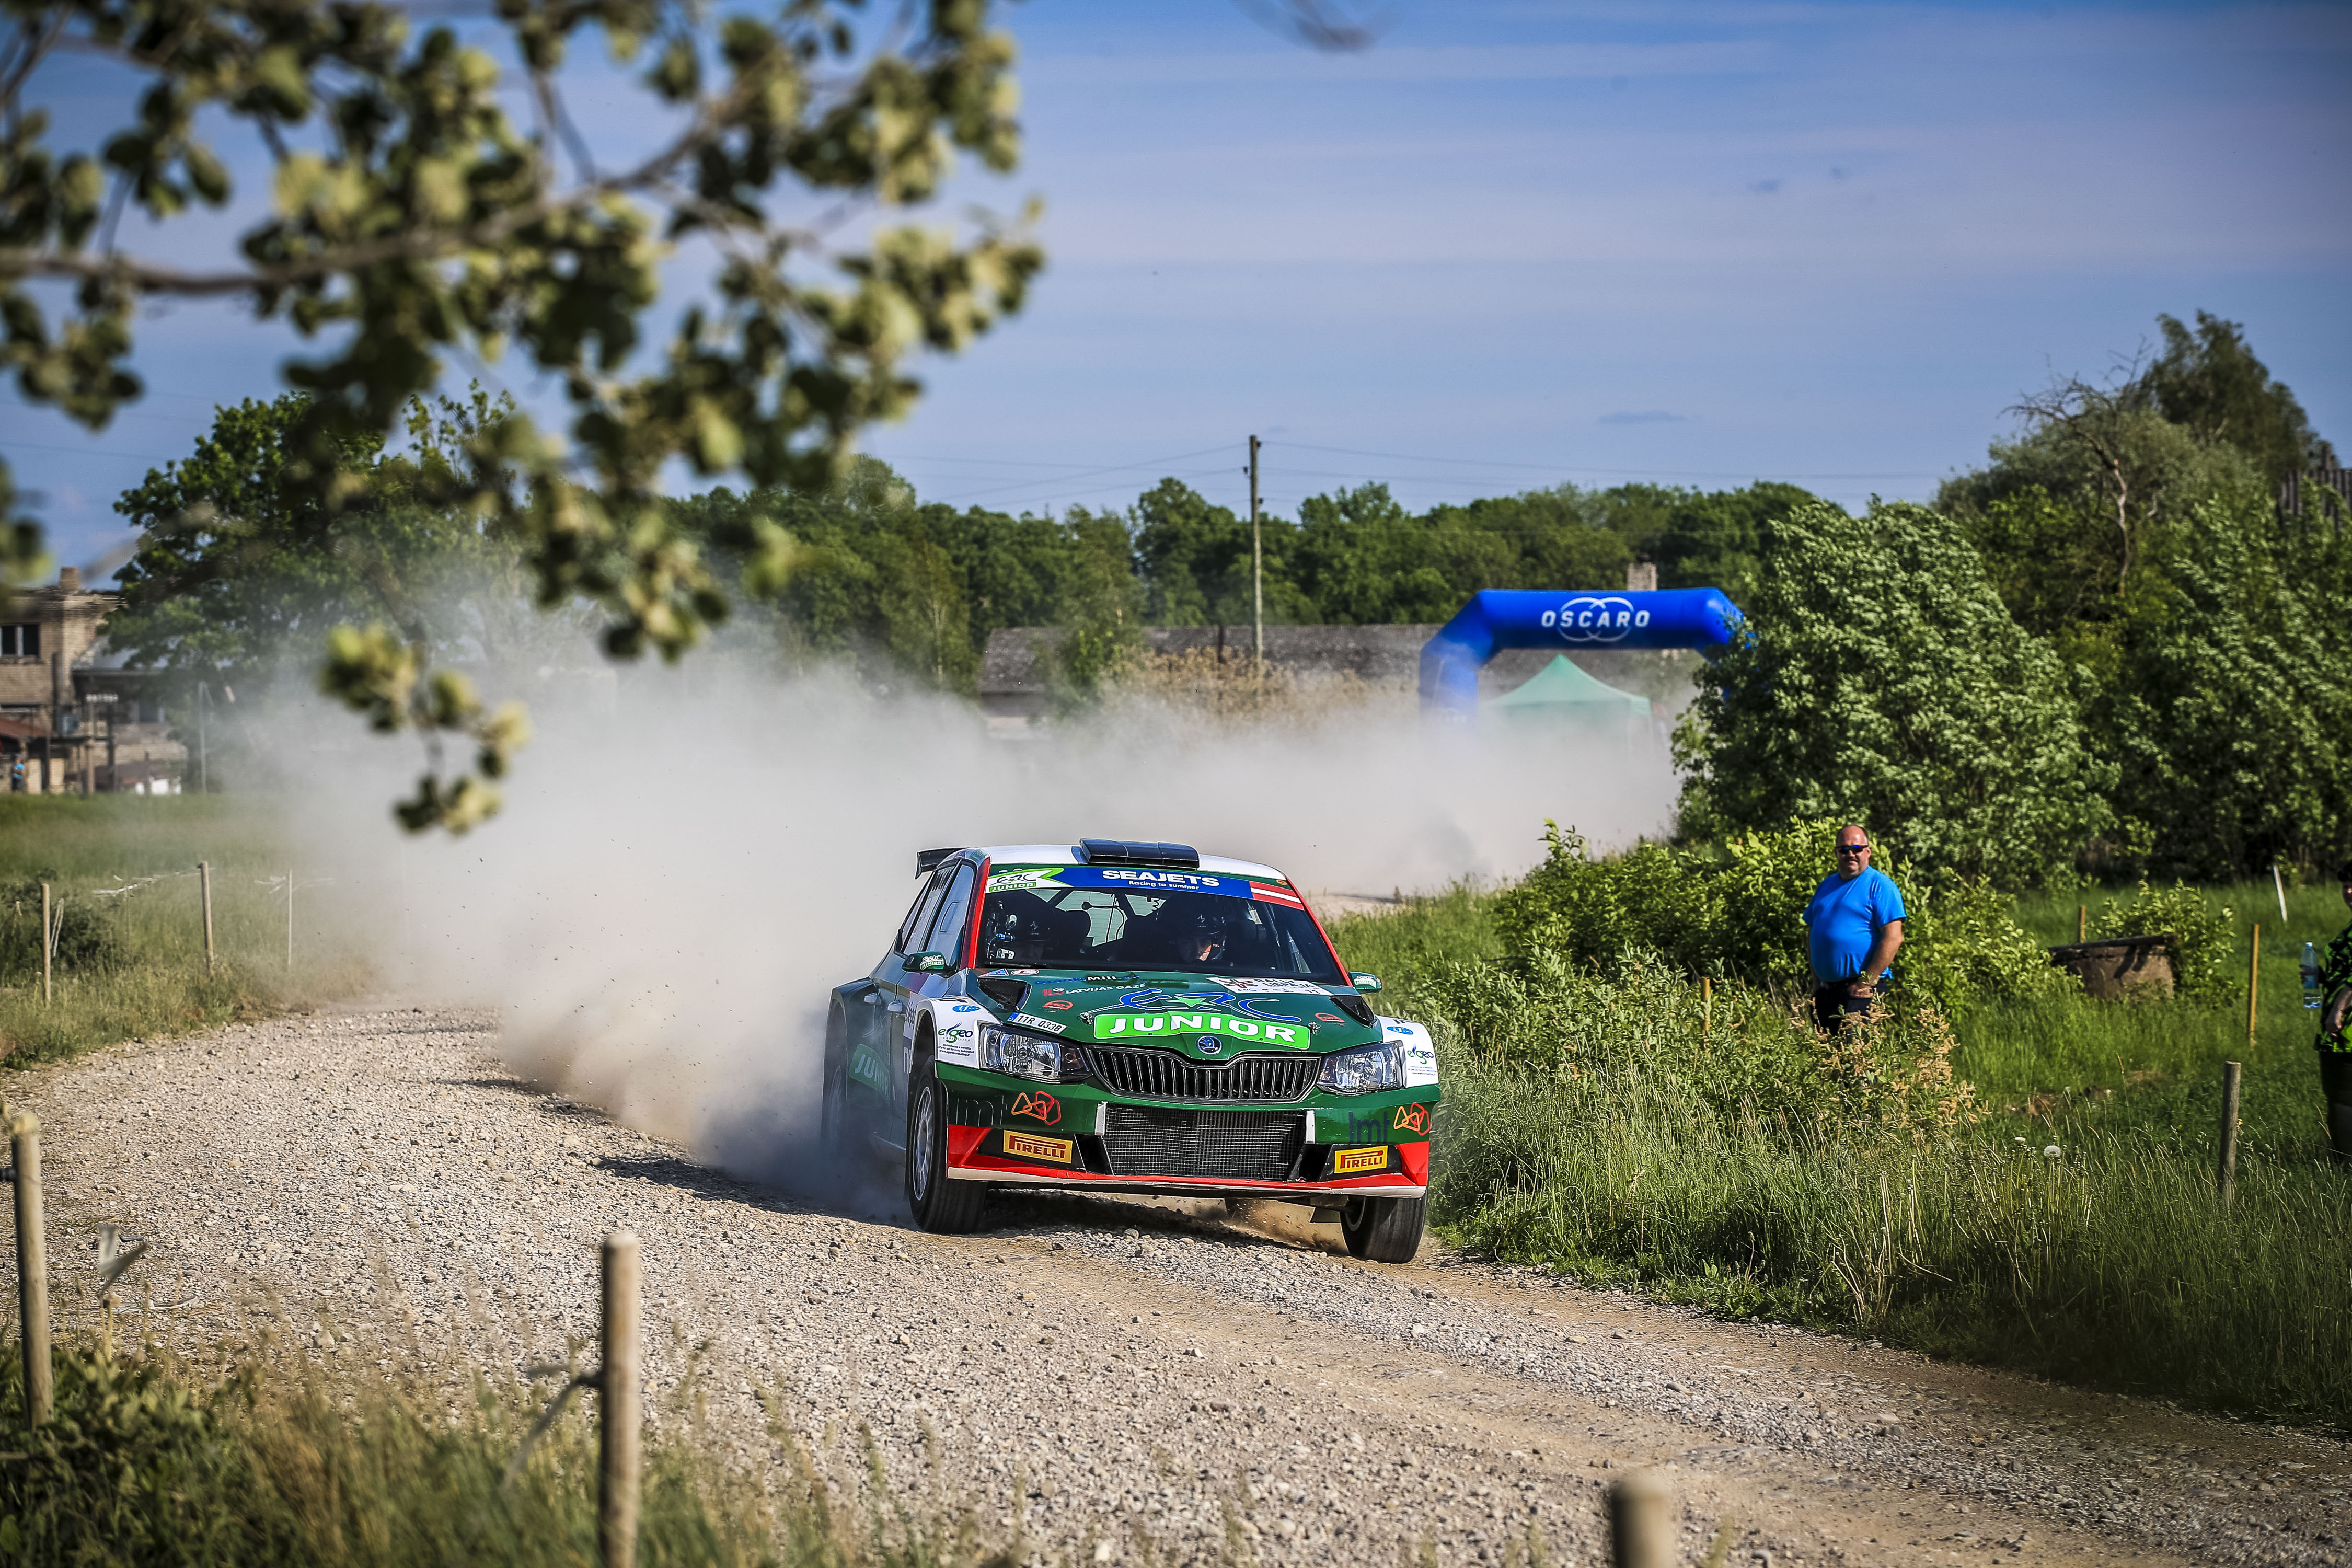 11 Martins SESKS, (LVA), Krisjanis CAUNE, (LVA), Skoda Fabia R5, LMT Autosporta Akademija, action during the 2019 European Rally Championship ERC Liepaja rally,  from may 24 to 26, at Liepaja, Lettonie - Photo Gregory Lenormand / DPPI